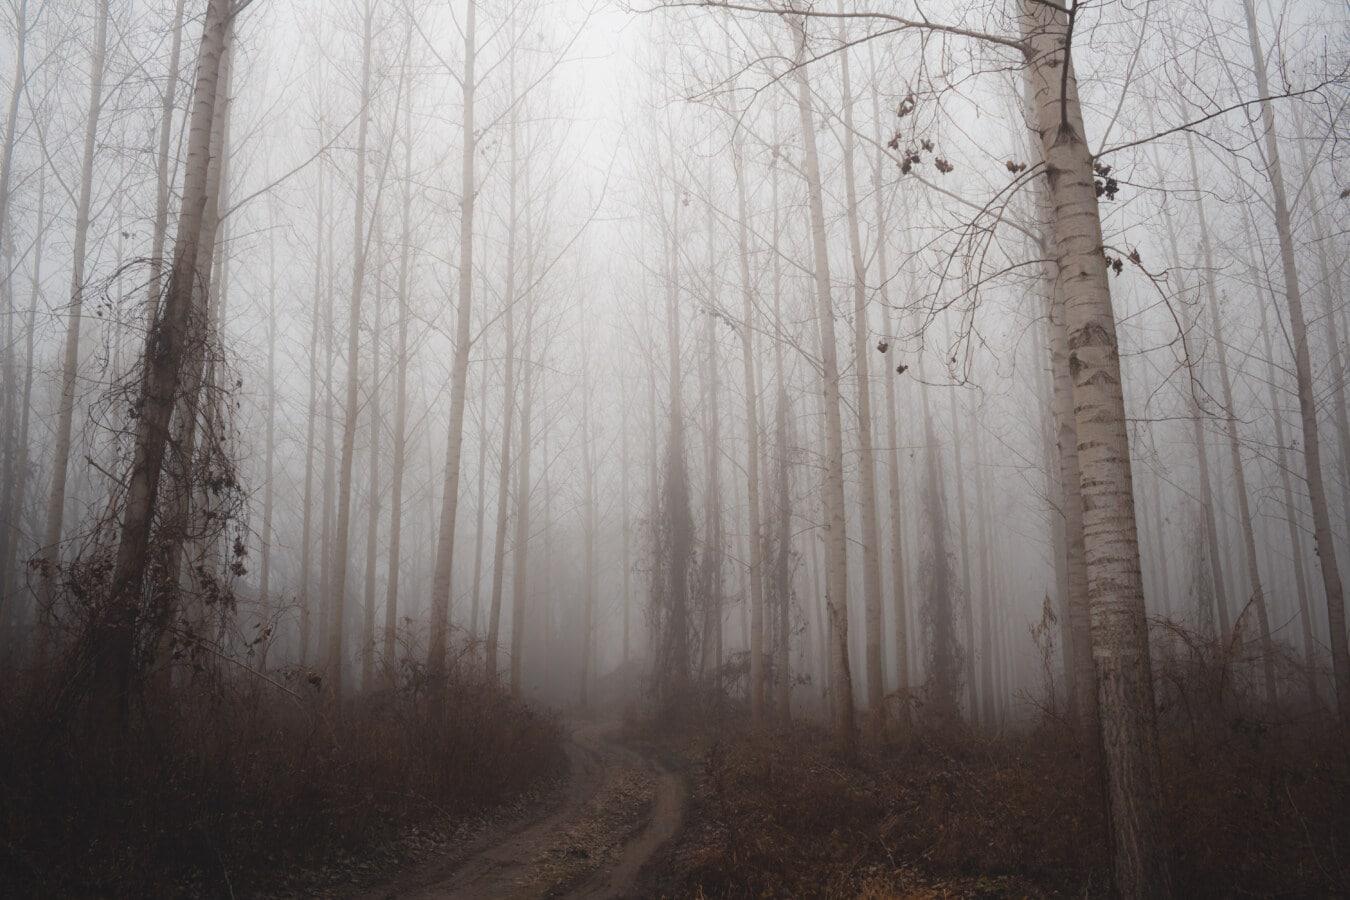 foggy, forest, forest path, winter, fog, wood, landscape, mist, tree, dawn